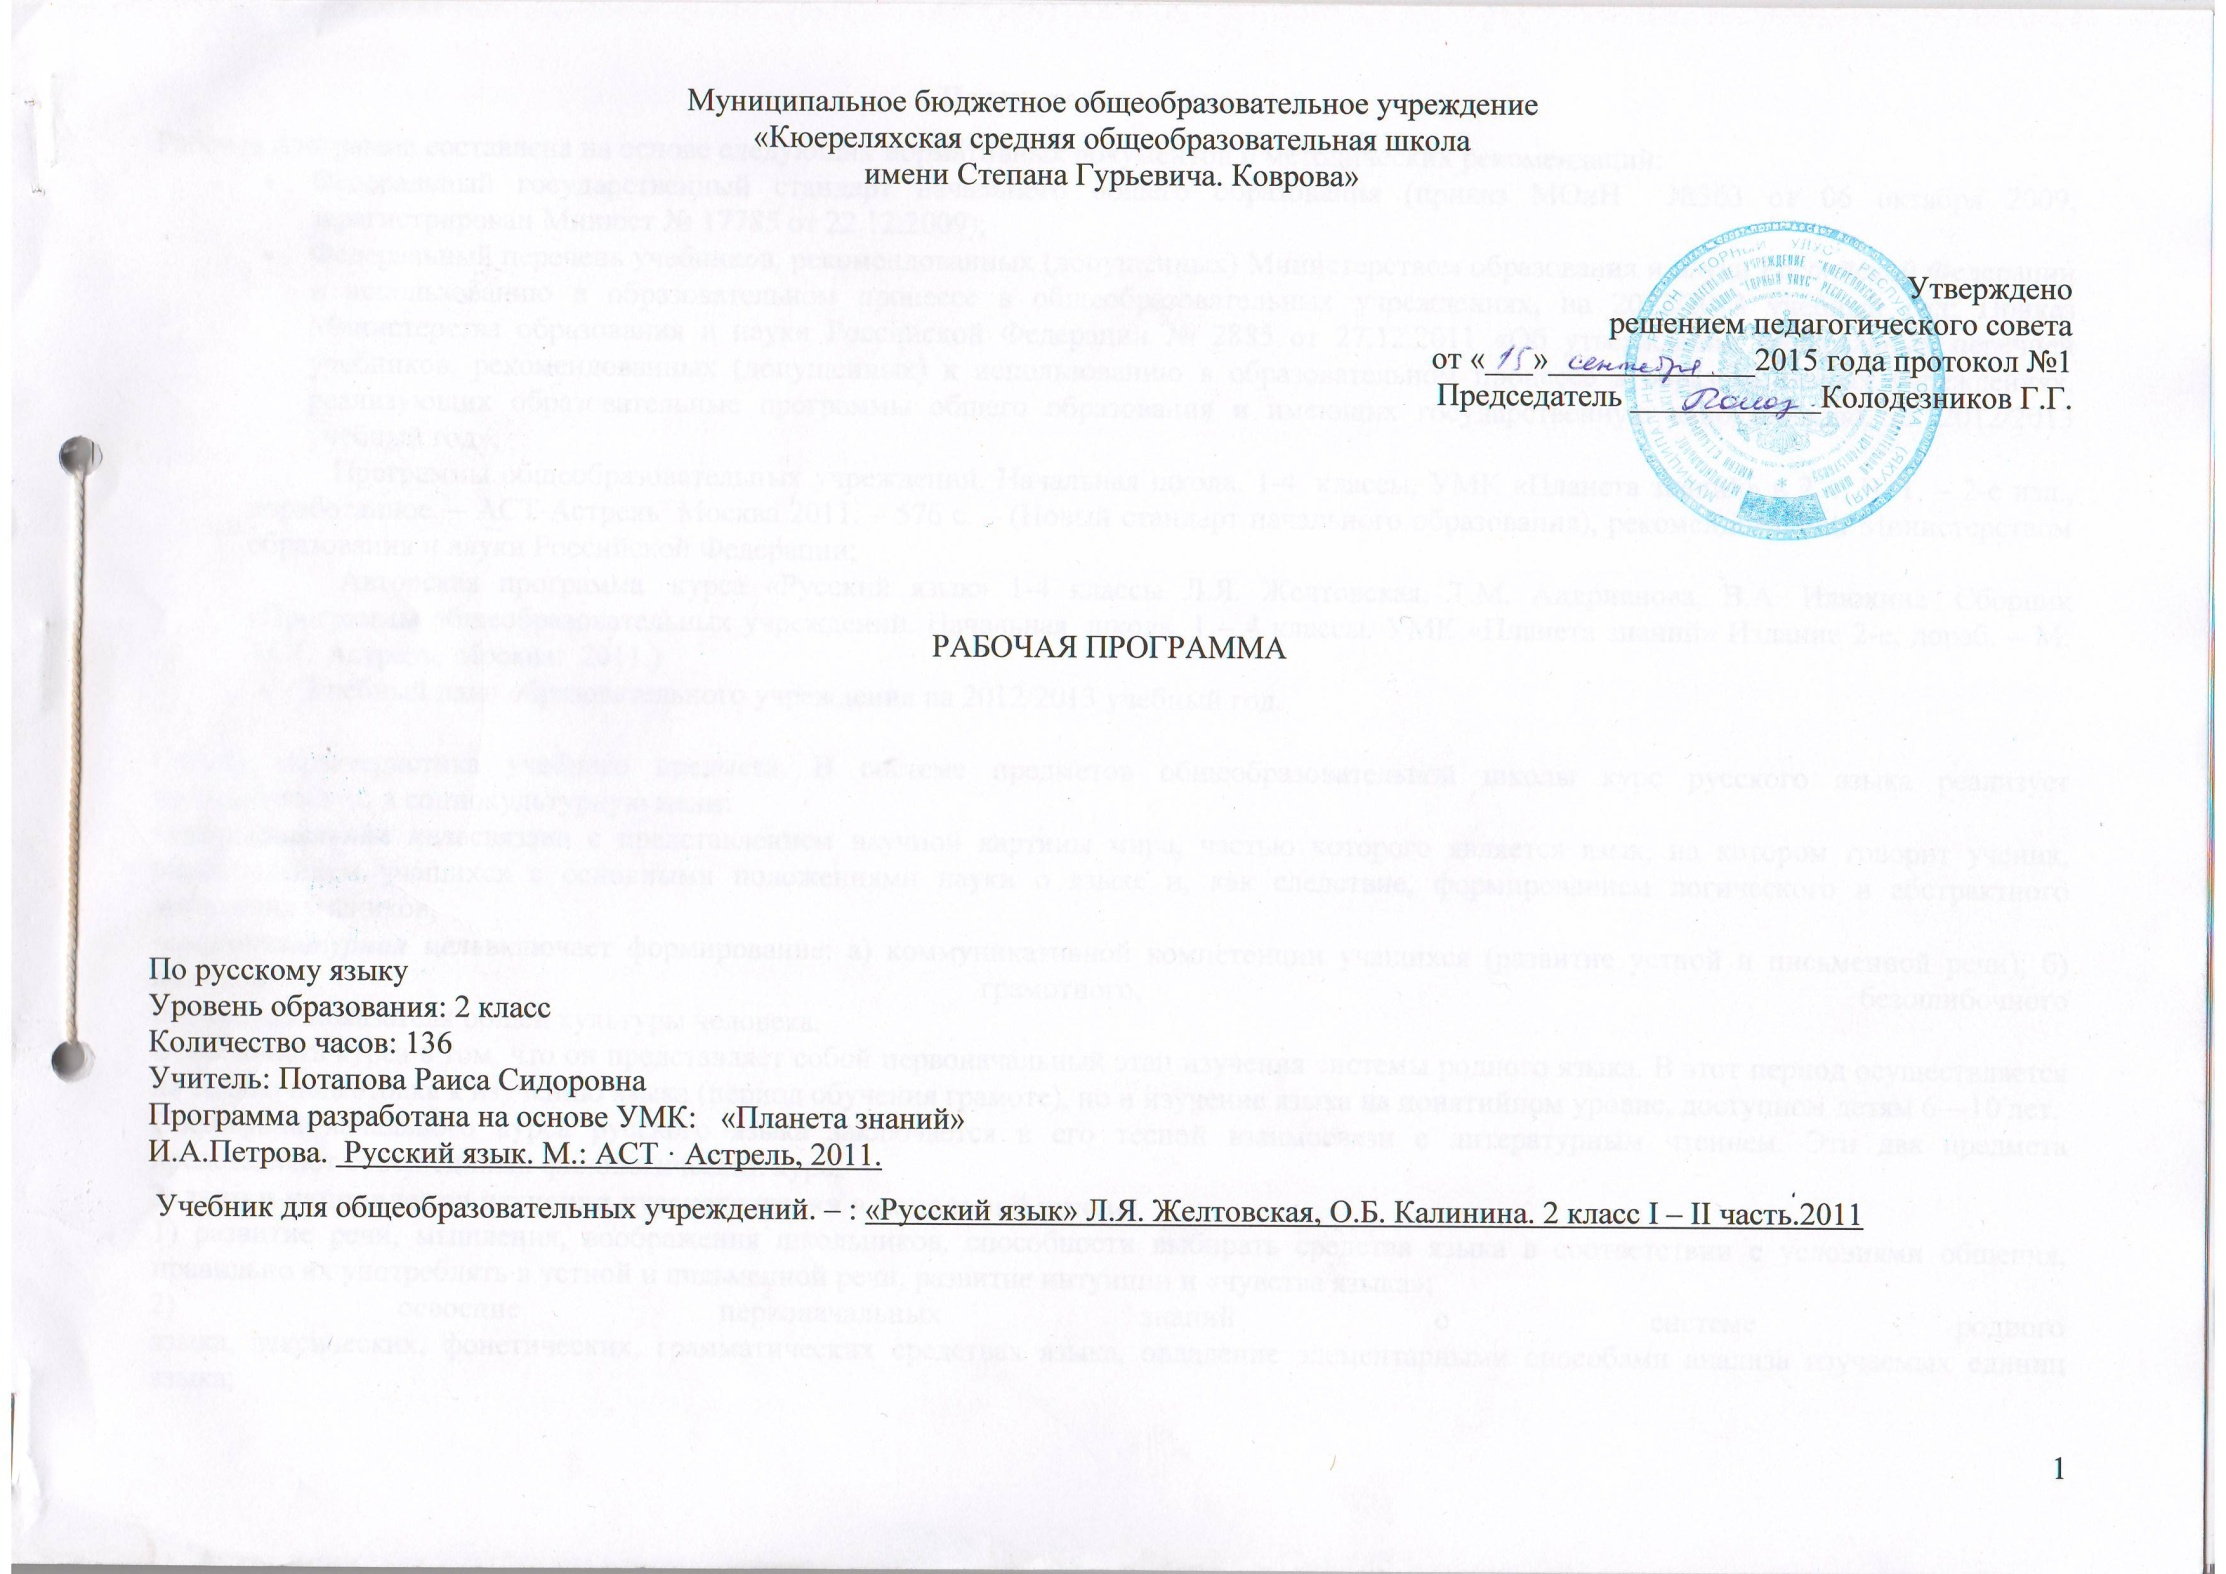 E:\Раиса Сидоровна\2015-2016\10011.JPG